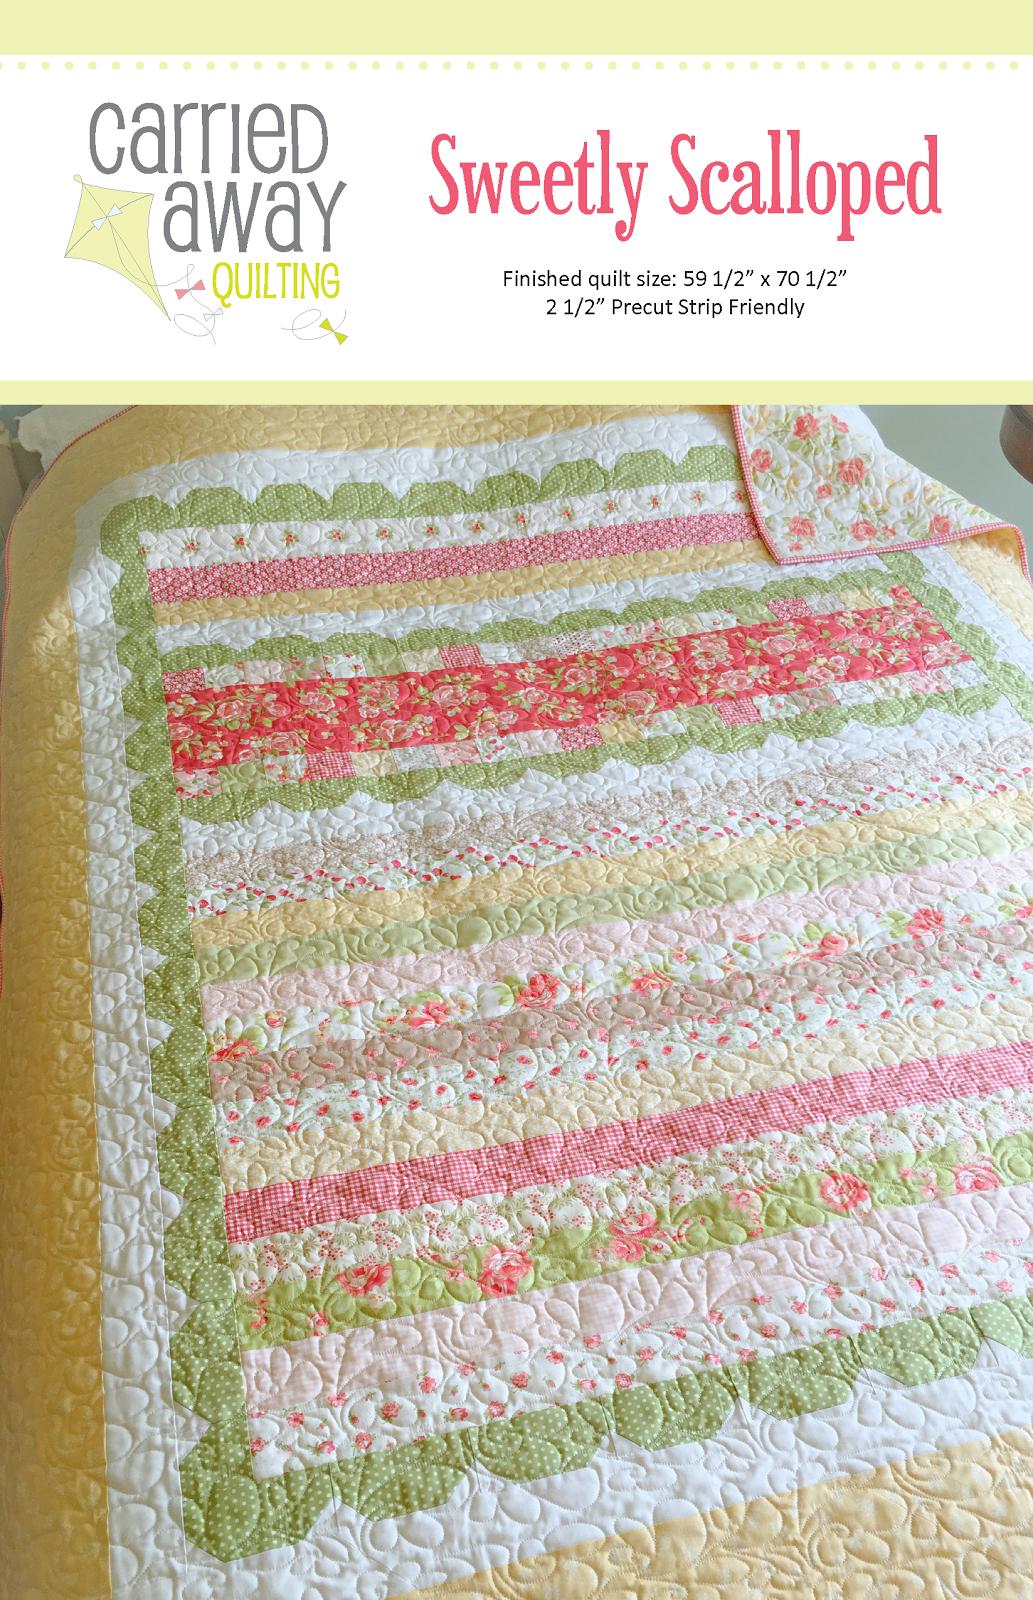 New Pattern: Sweetly Scalloped